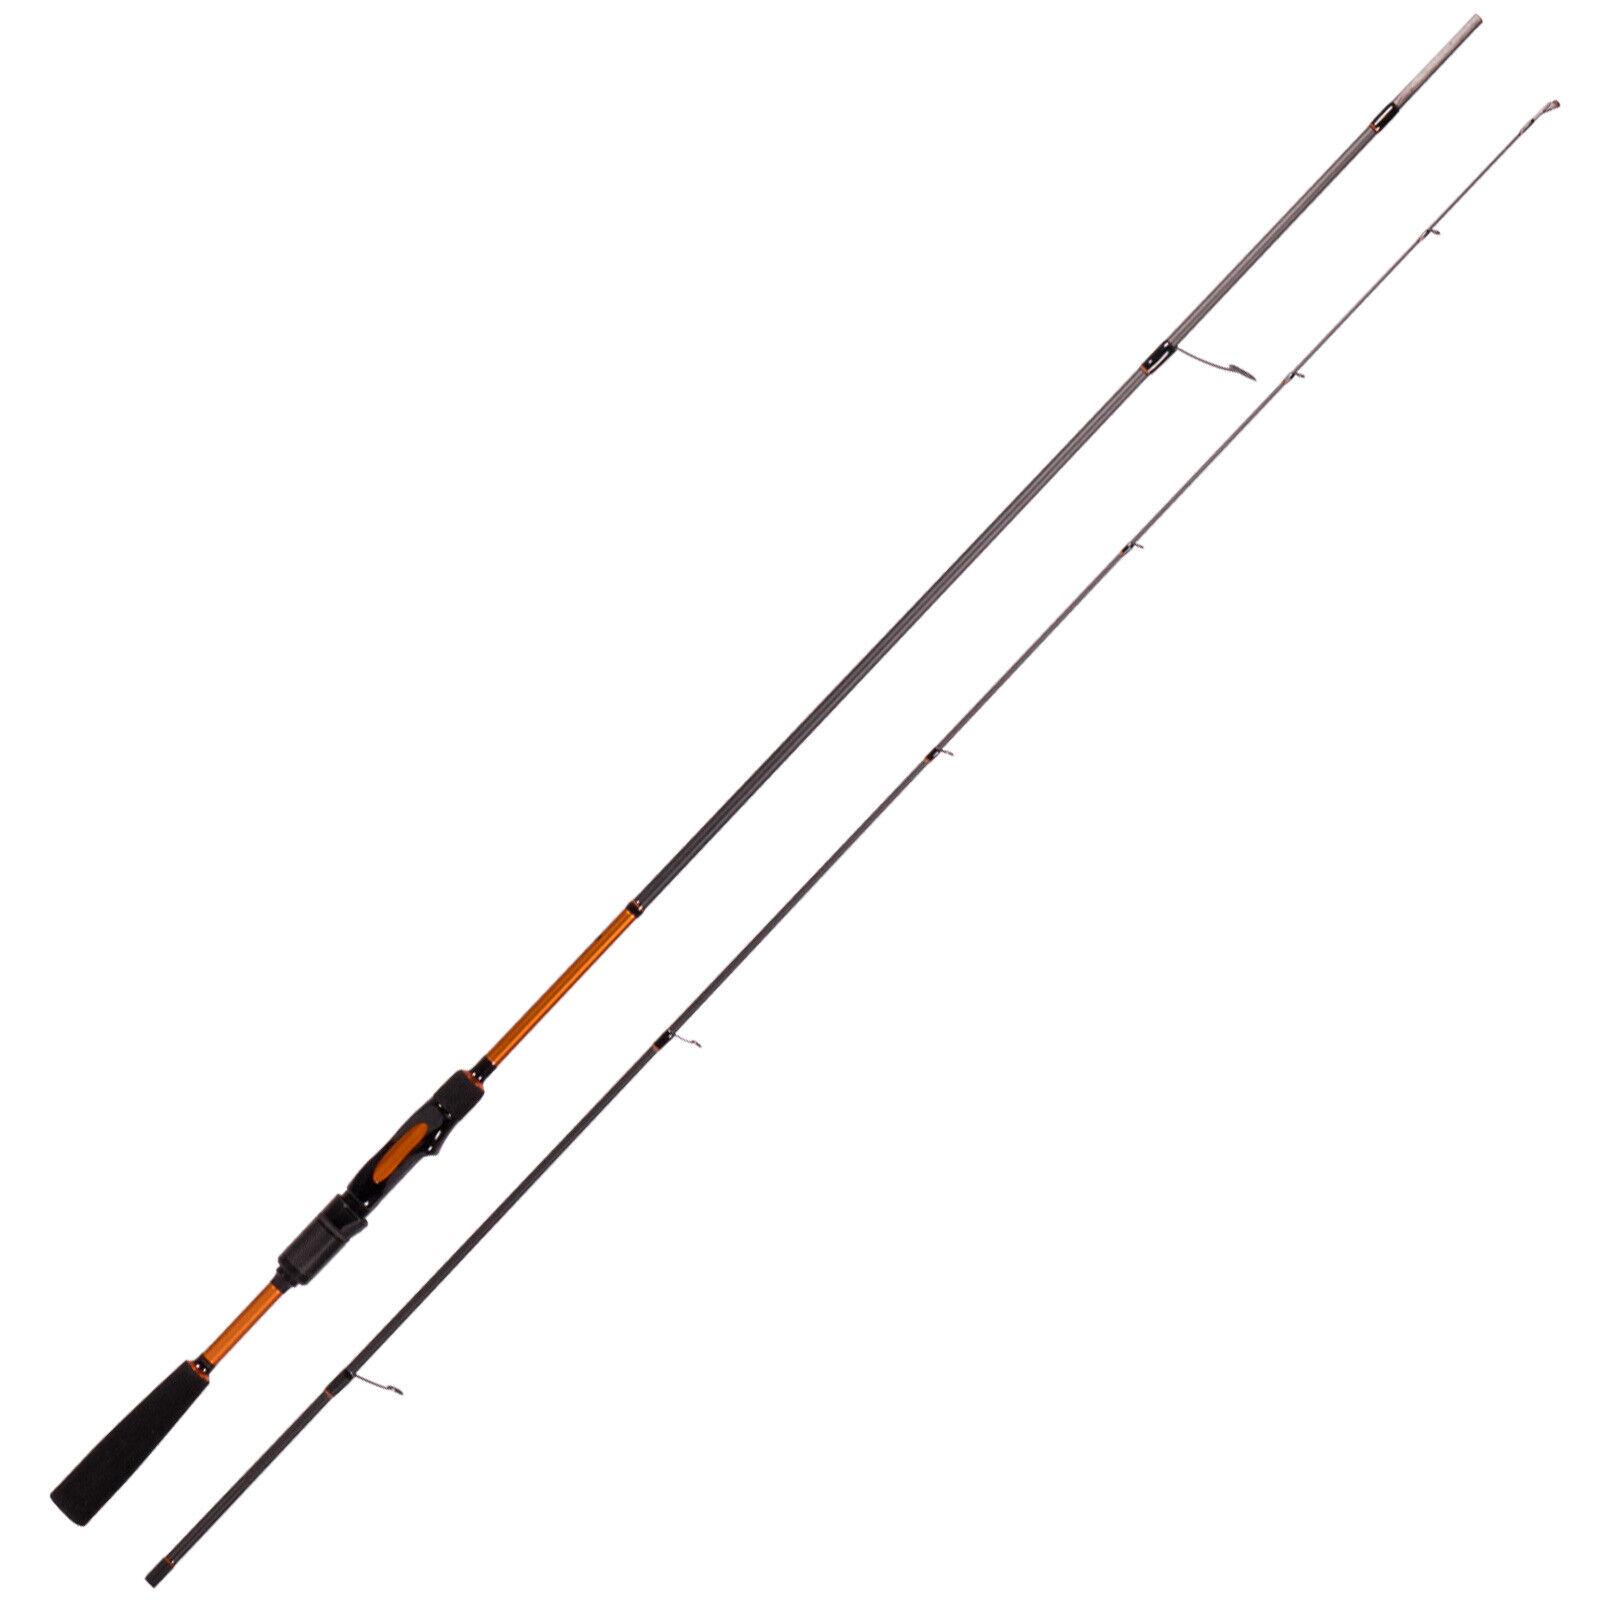 Zeck Angelrute Barschrute Cherry Stick 230cm 4-16g